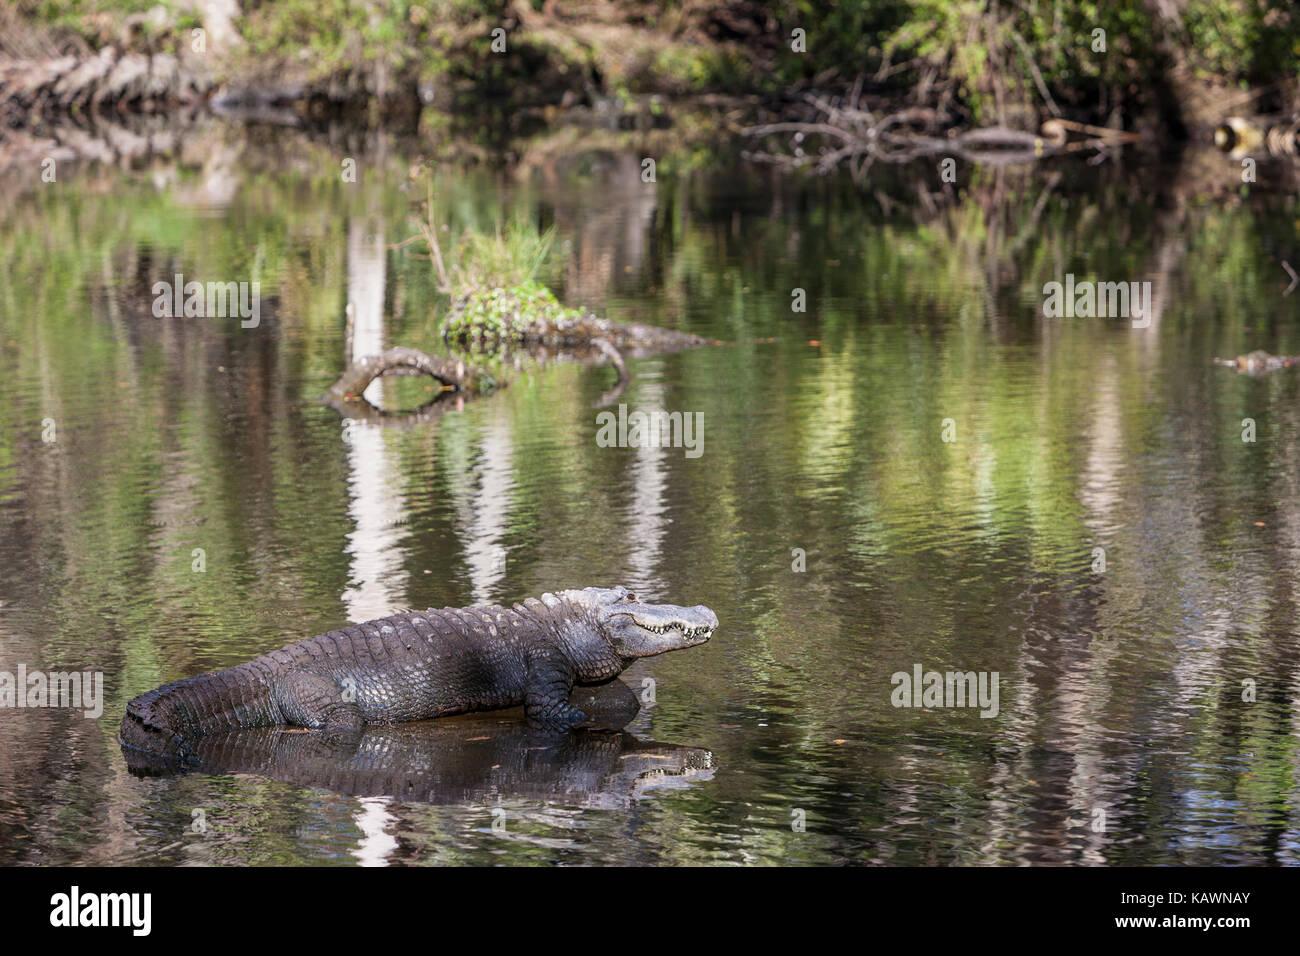 Alligator, Homosassa Springs State Park, Florida.  American Alligator. Stock Photo